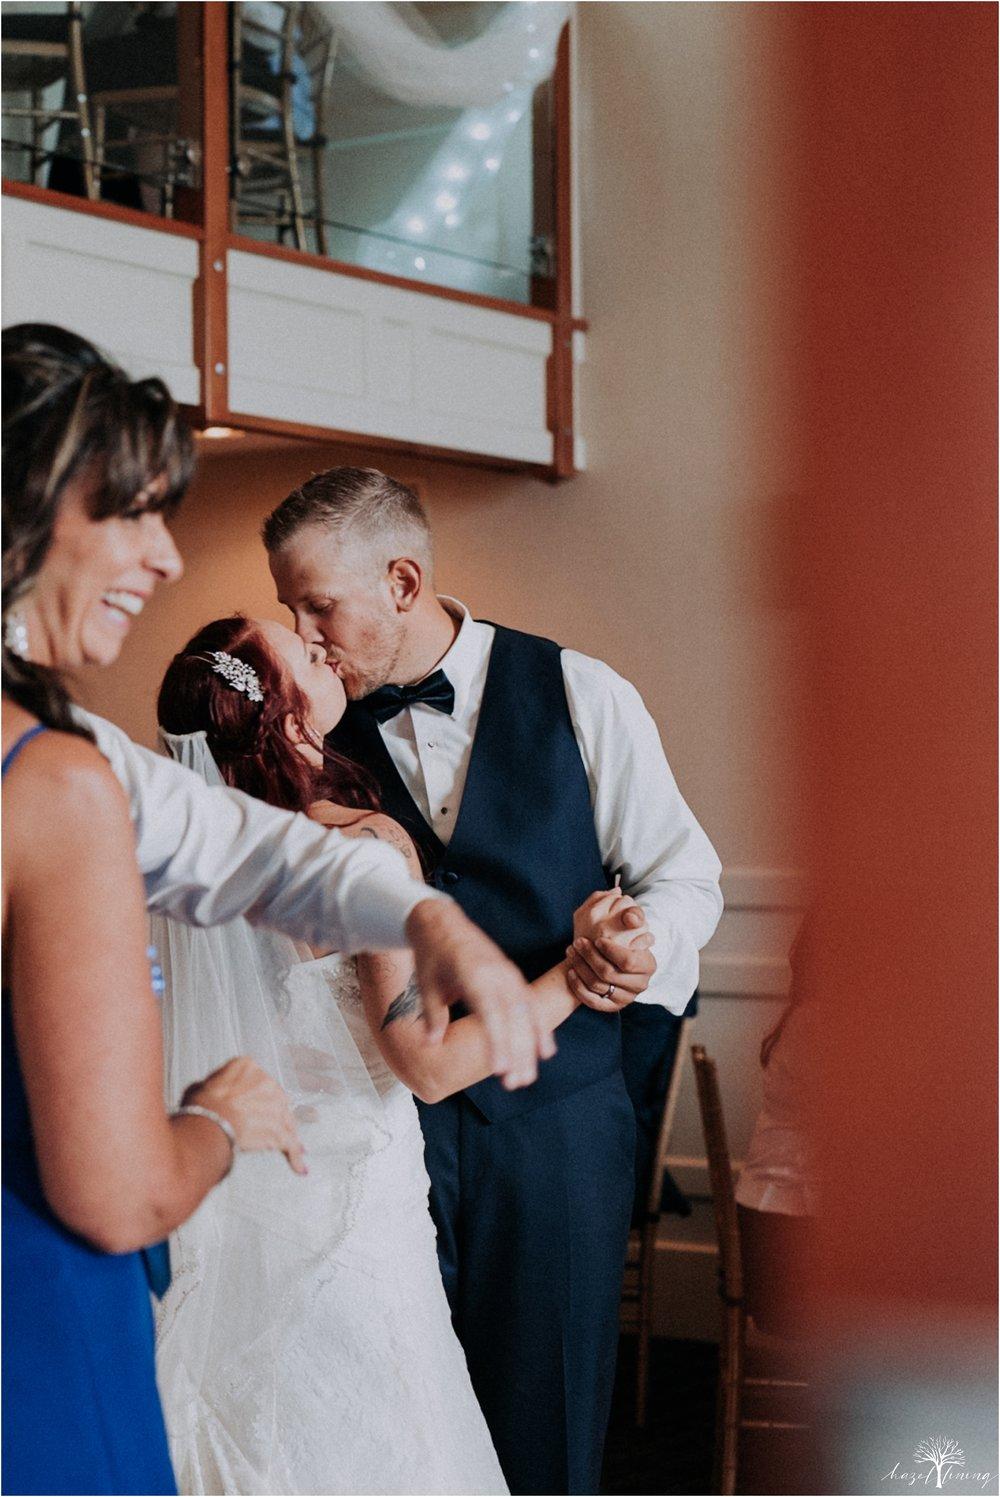 alyssa-james-stiteler-wedding-loft-and-sweet-water-cc-pennsburg-pennsylvania-hazel-lining-travel-wedding-elopement-photography_0131.jpg